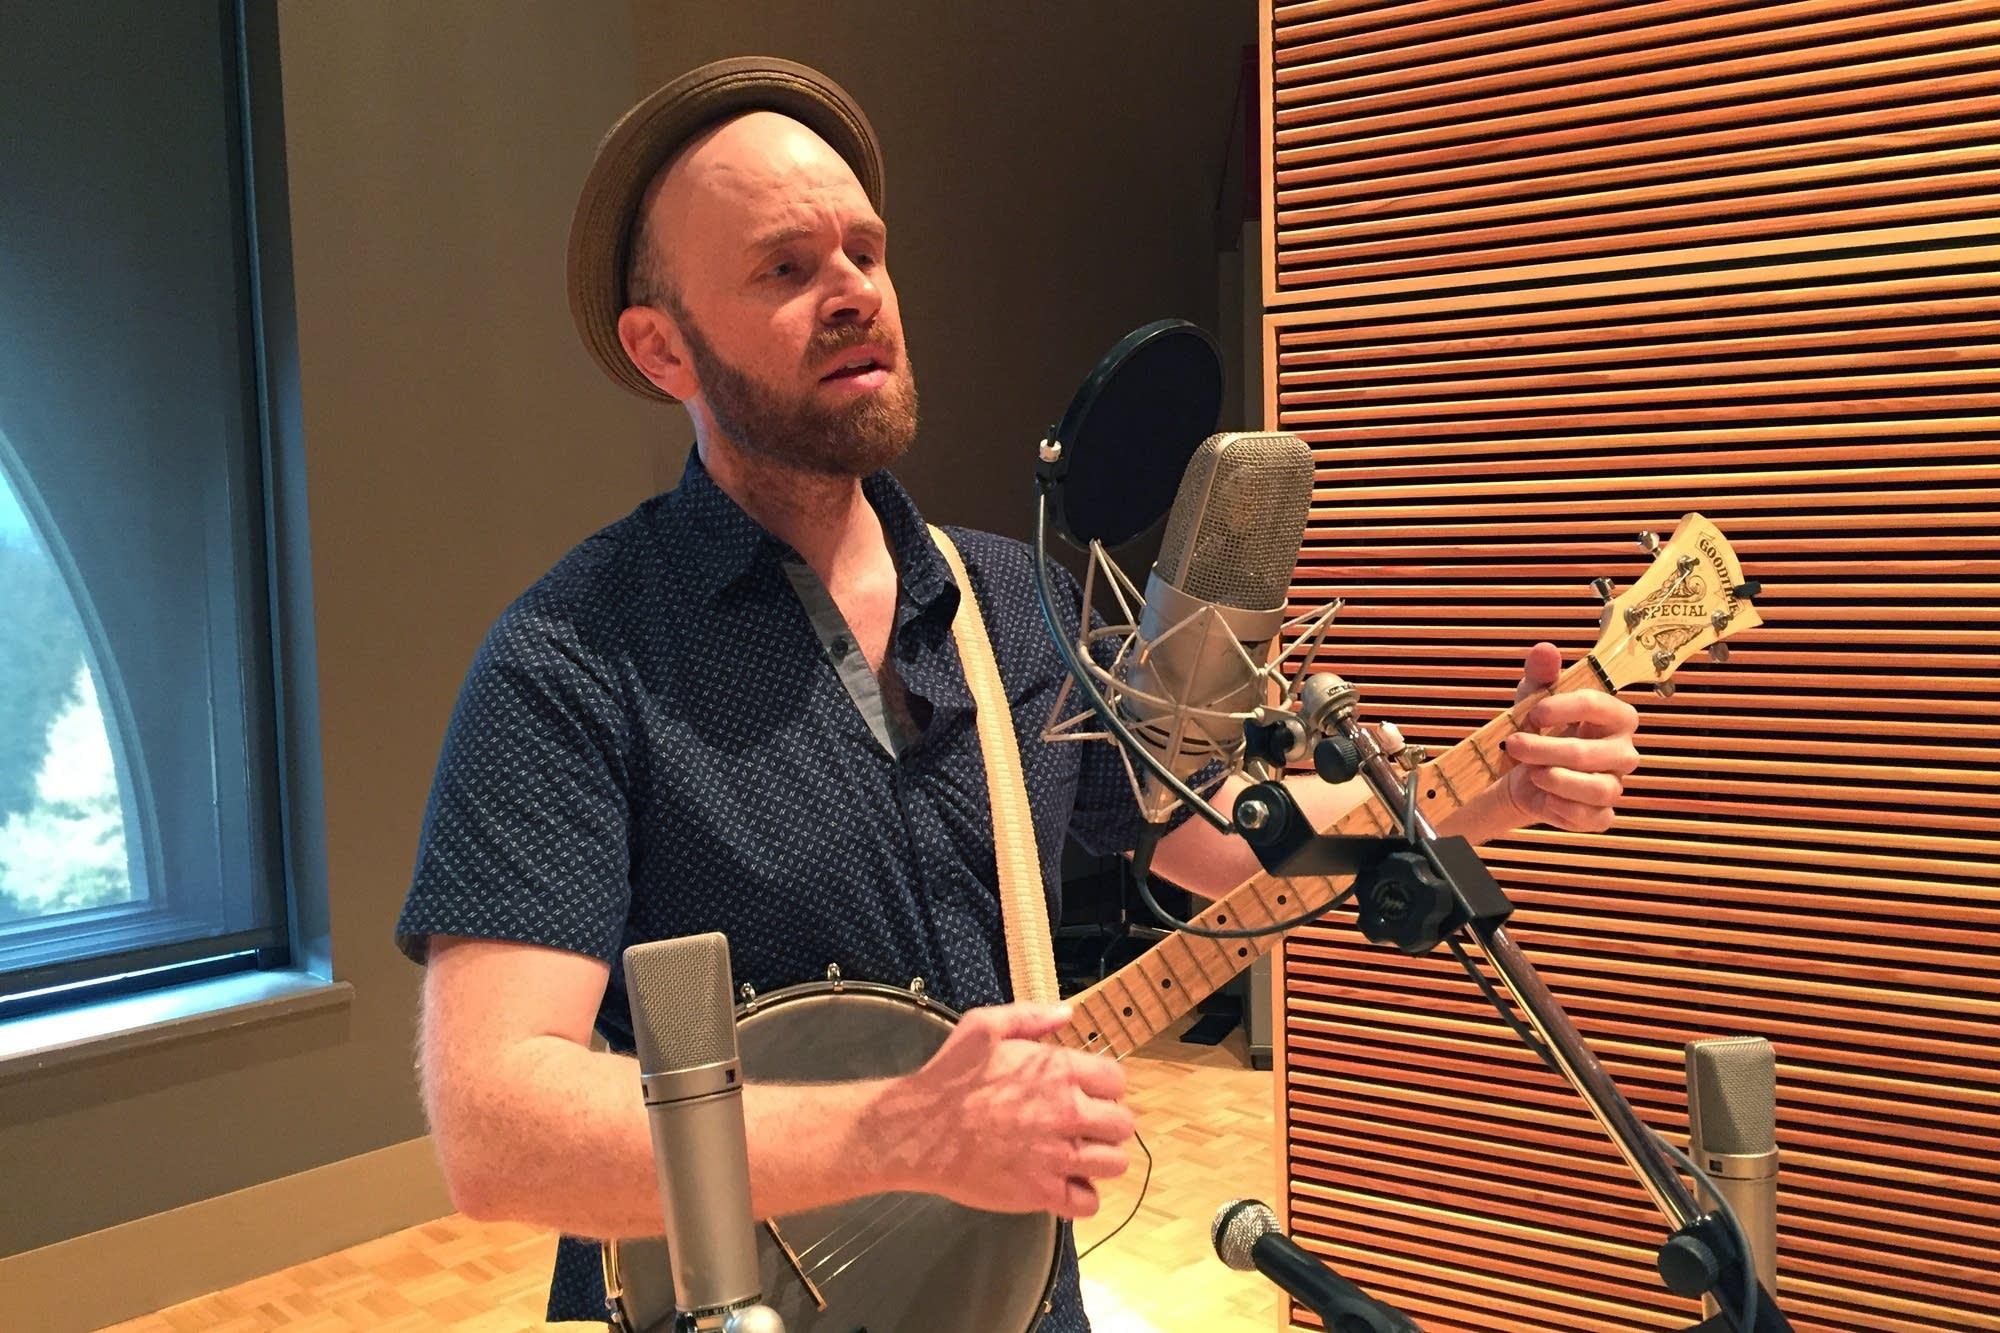 Robinson & Rohe perform in the Radio Heartland studio